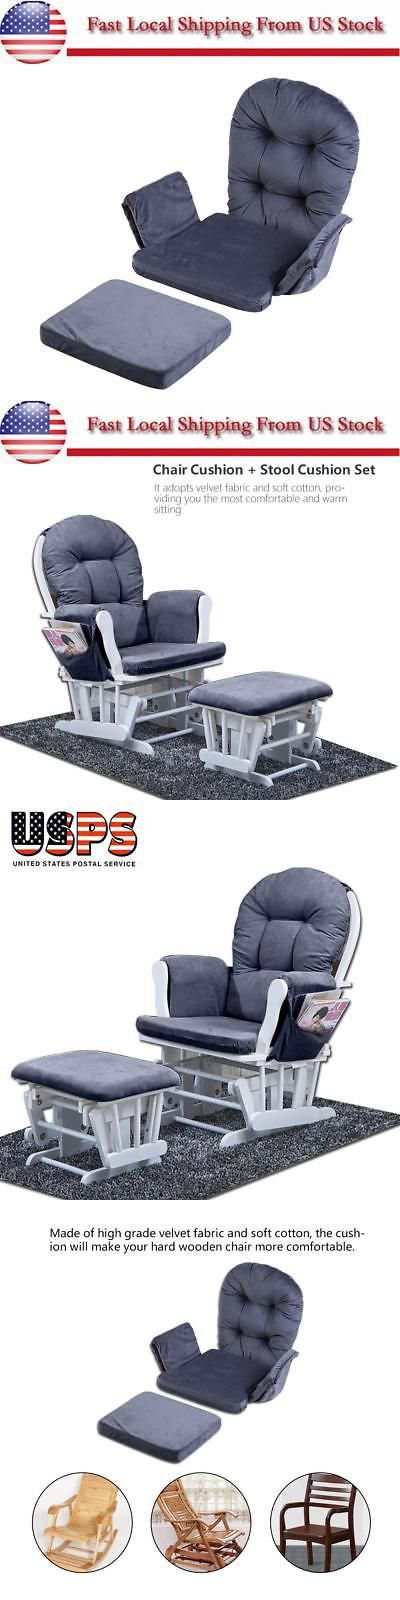 For Baby Nursery Rocker Rocking Chair Glider /& Ottoman Stool Seat Soft Cushion